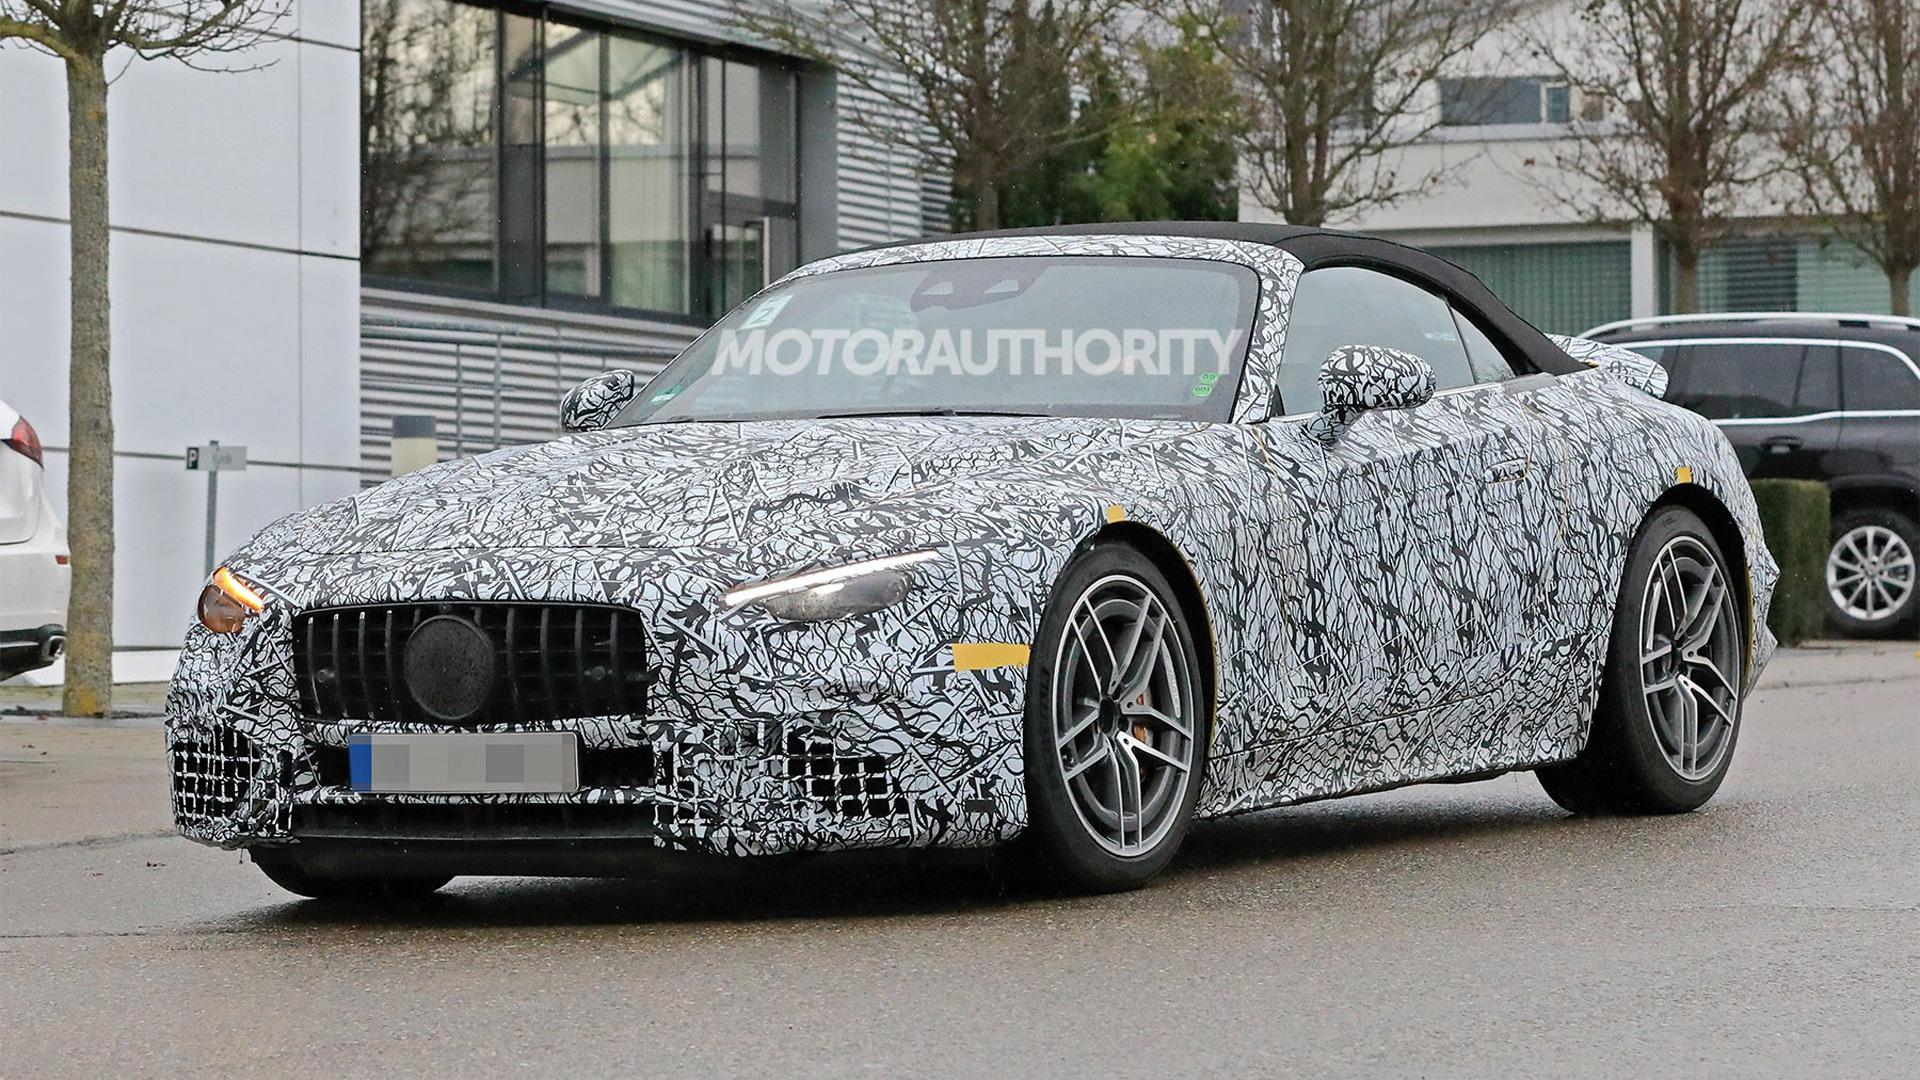 2022 Mercedes-Benz AMG SL63 Roadster spy shots - Photo credit: S. Baldauf / SB-Medien